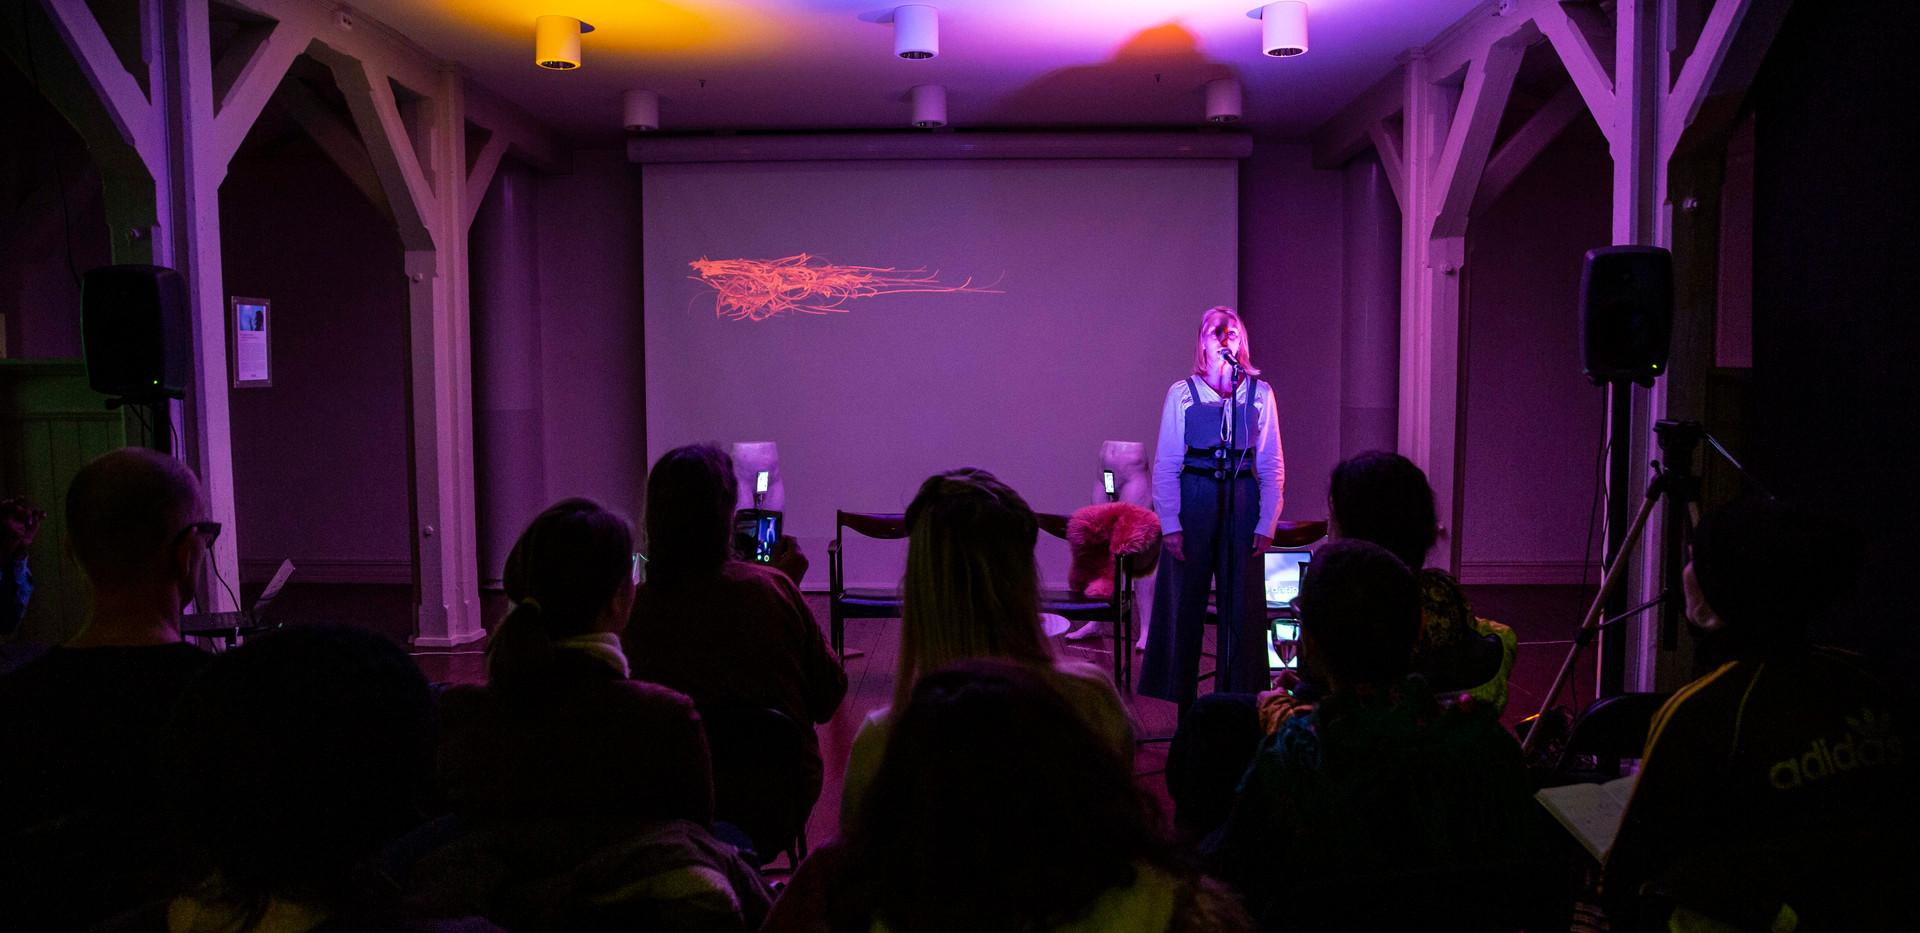 Nina + audience2 nov 2019.JPG